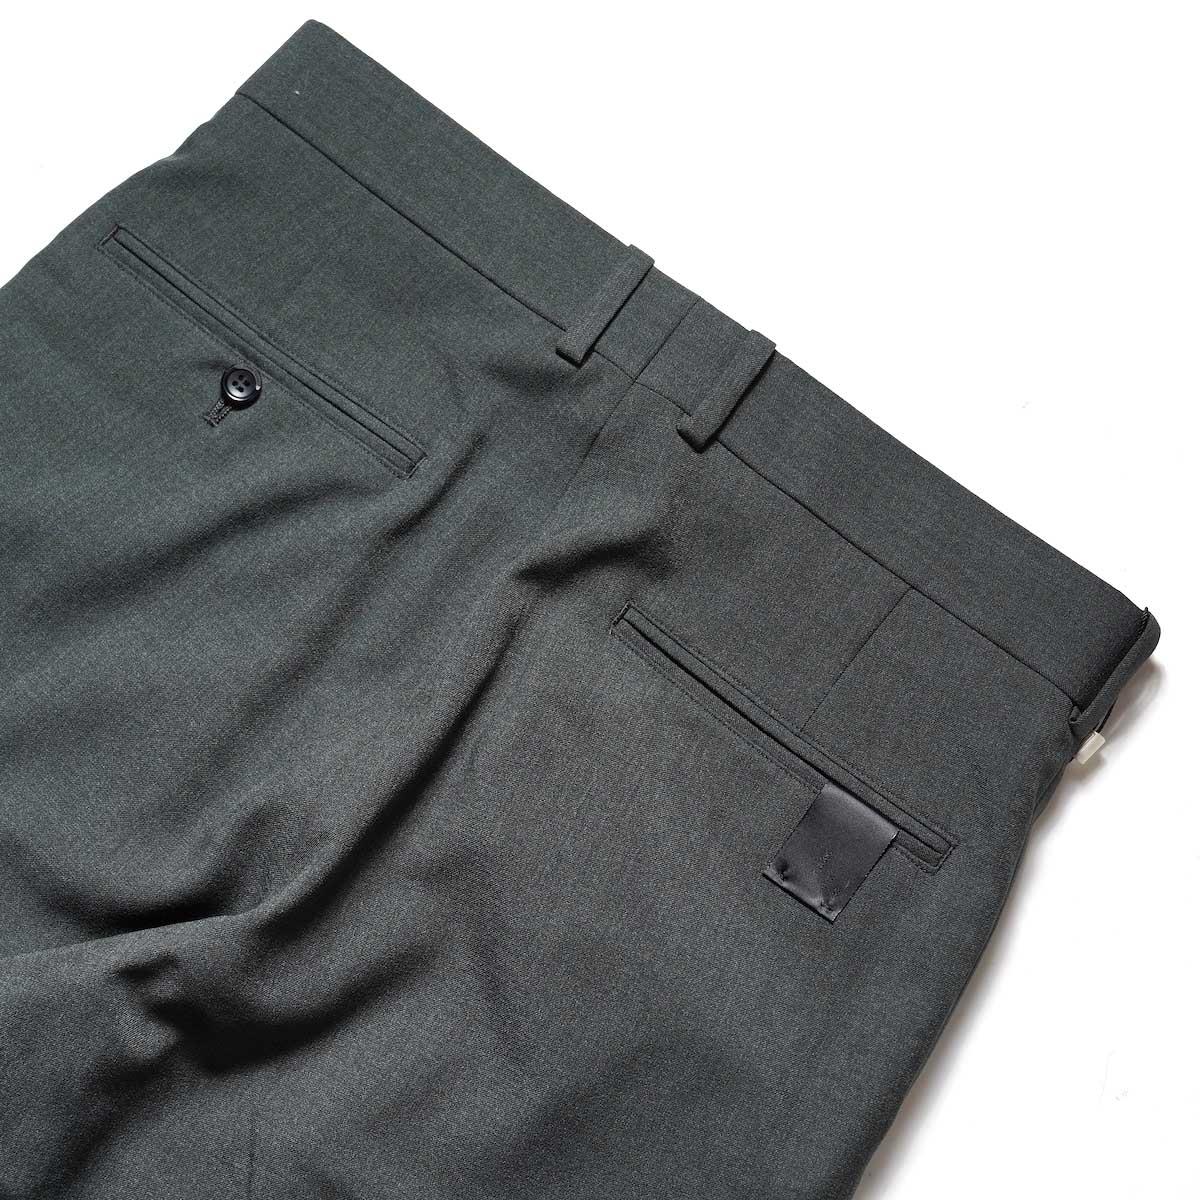 N.HOOLYWOOD / 2212-PT21-008 Flair Slacks (Charcoal)ヒップポケット